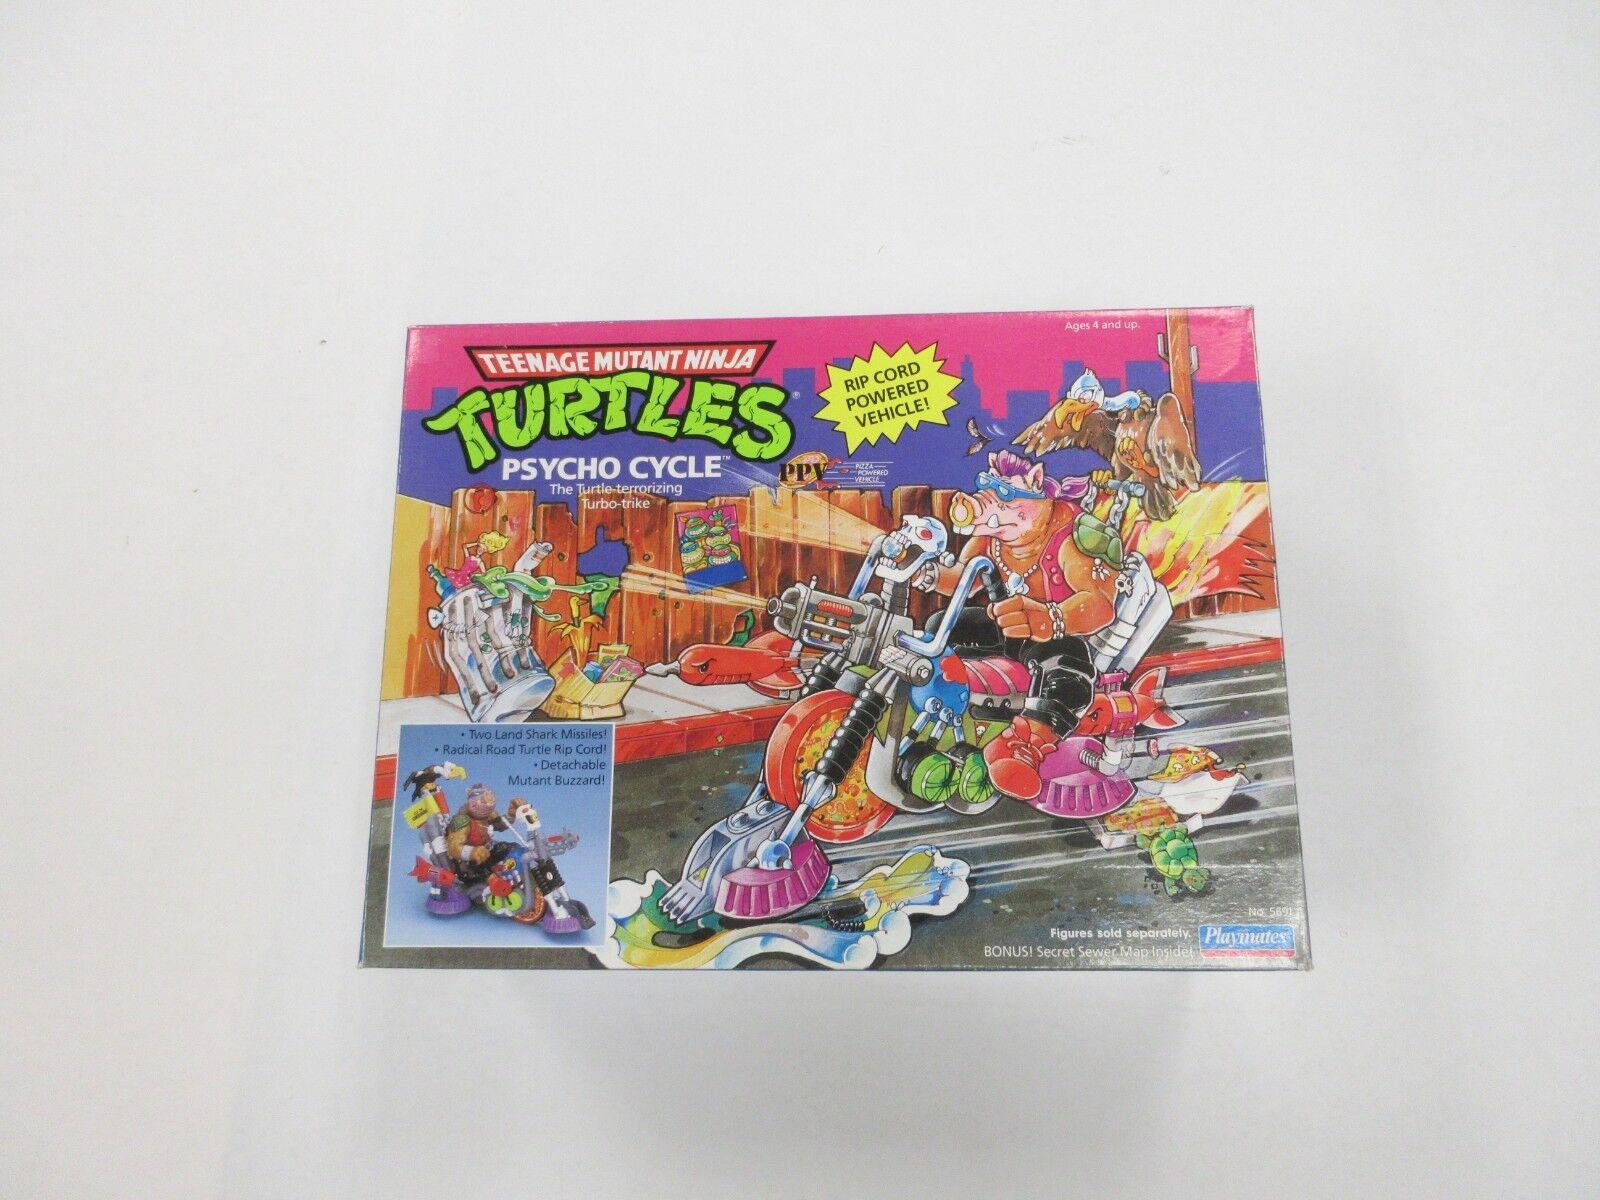 1990 1990 1990 TMNT NINJA TURTLES PSYCHO CYCLE FIGURE VEHICLE UNUSED WITH BOX bc1e09